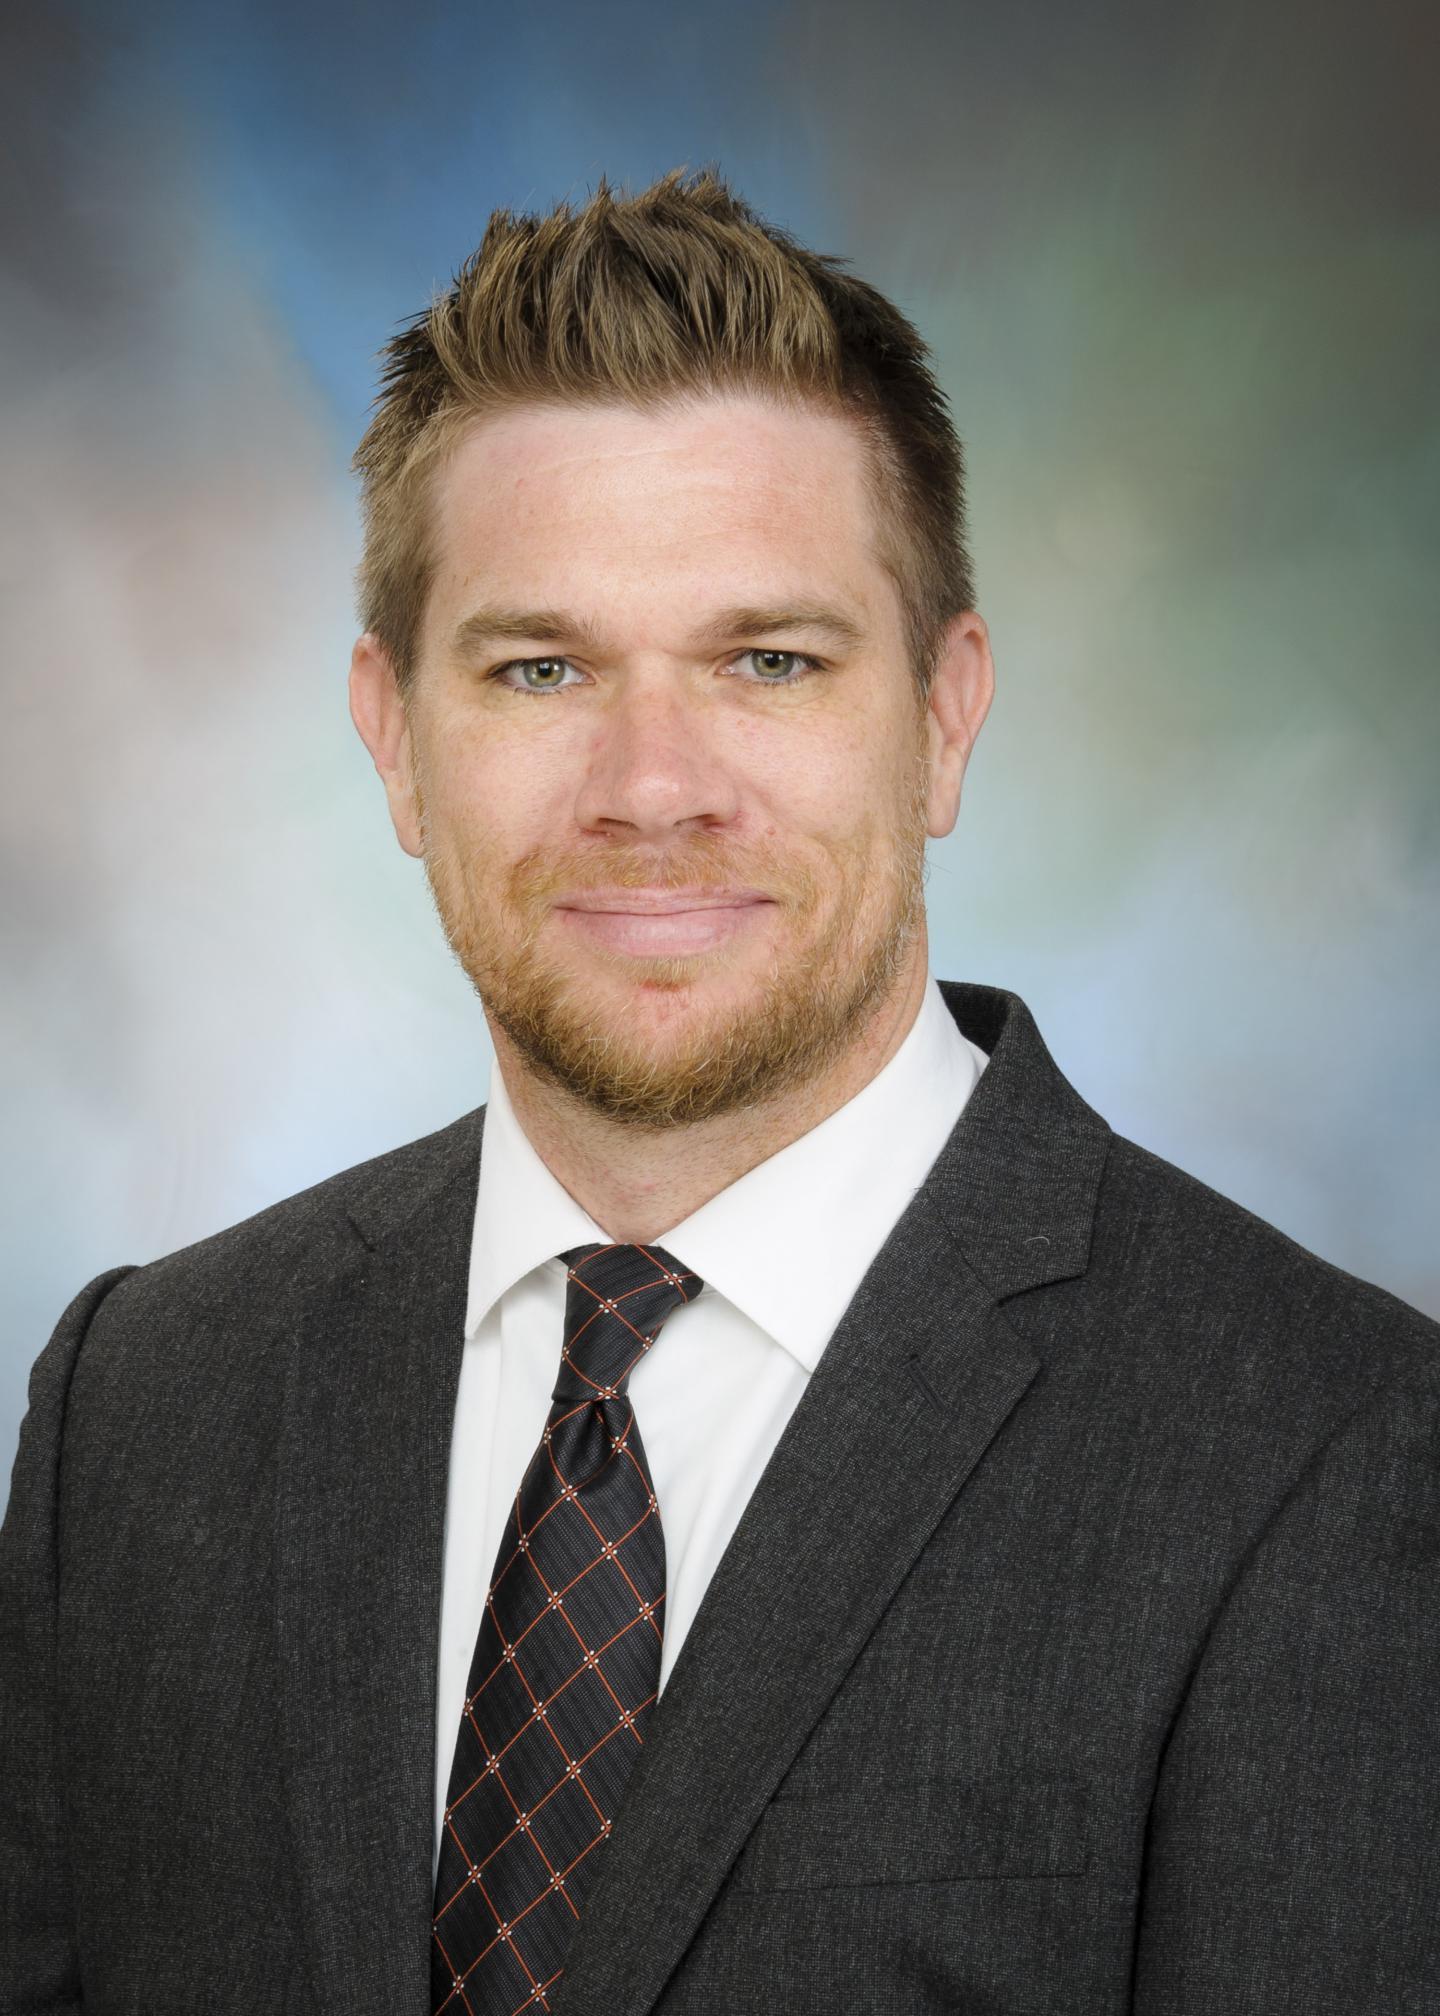 Jeff Temple, University of Texas Medical Branch at Galveston